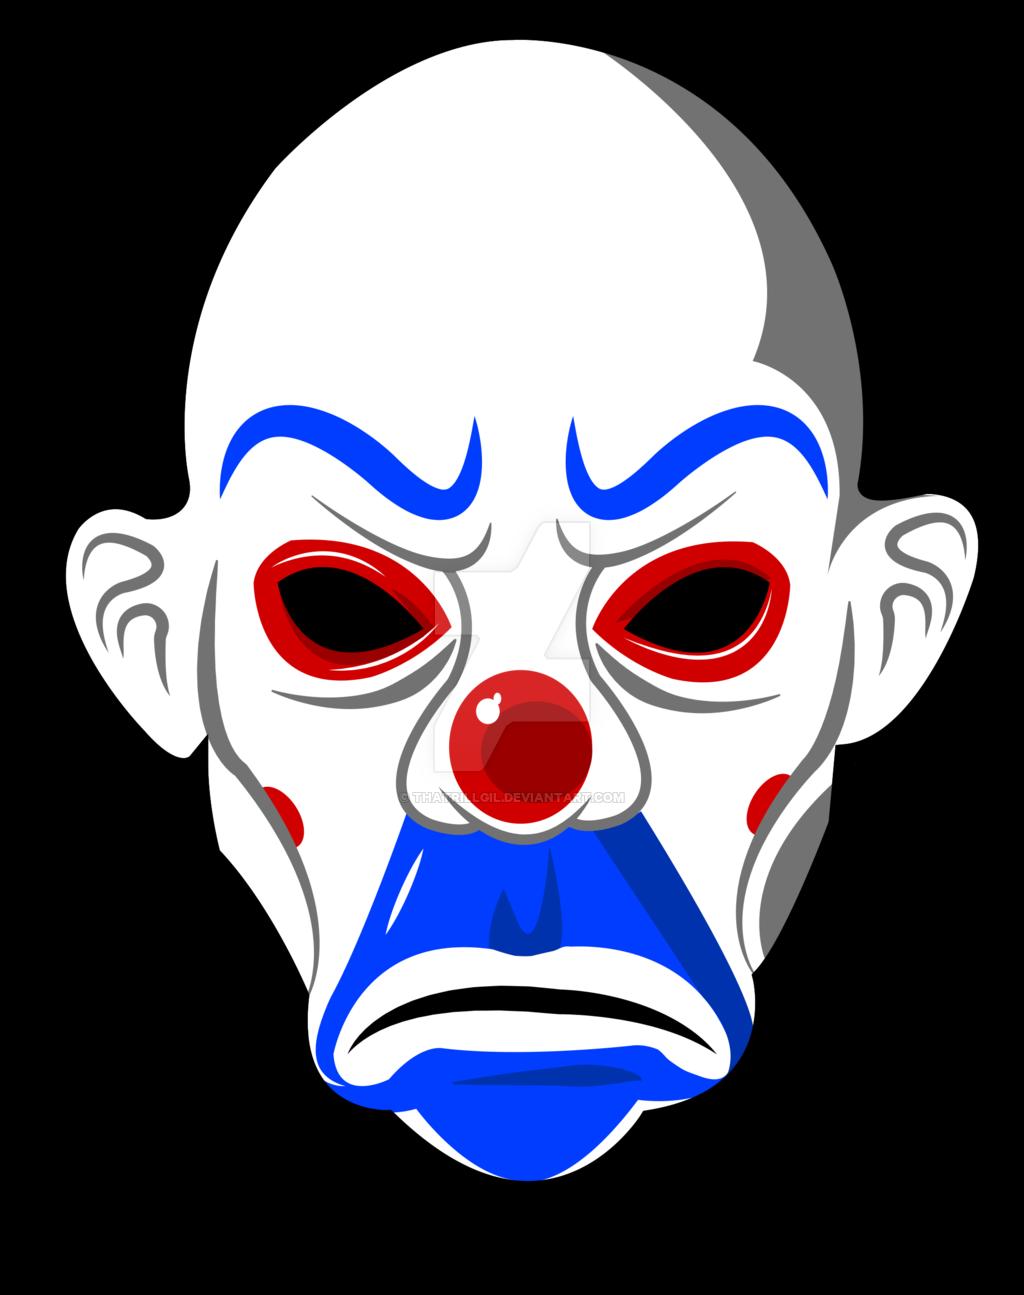 Joker by thatrillgil on. Clown clipart clown mask